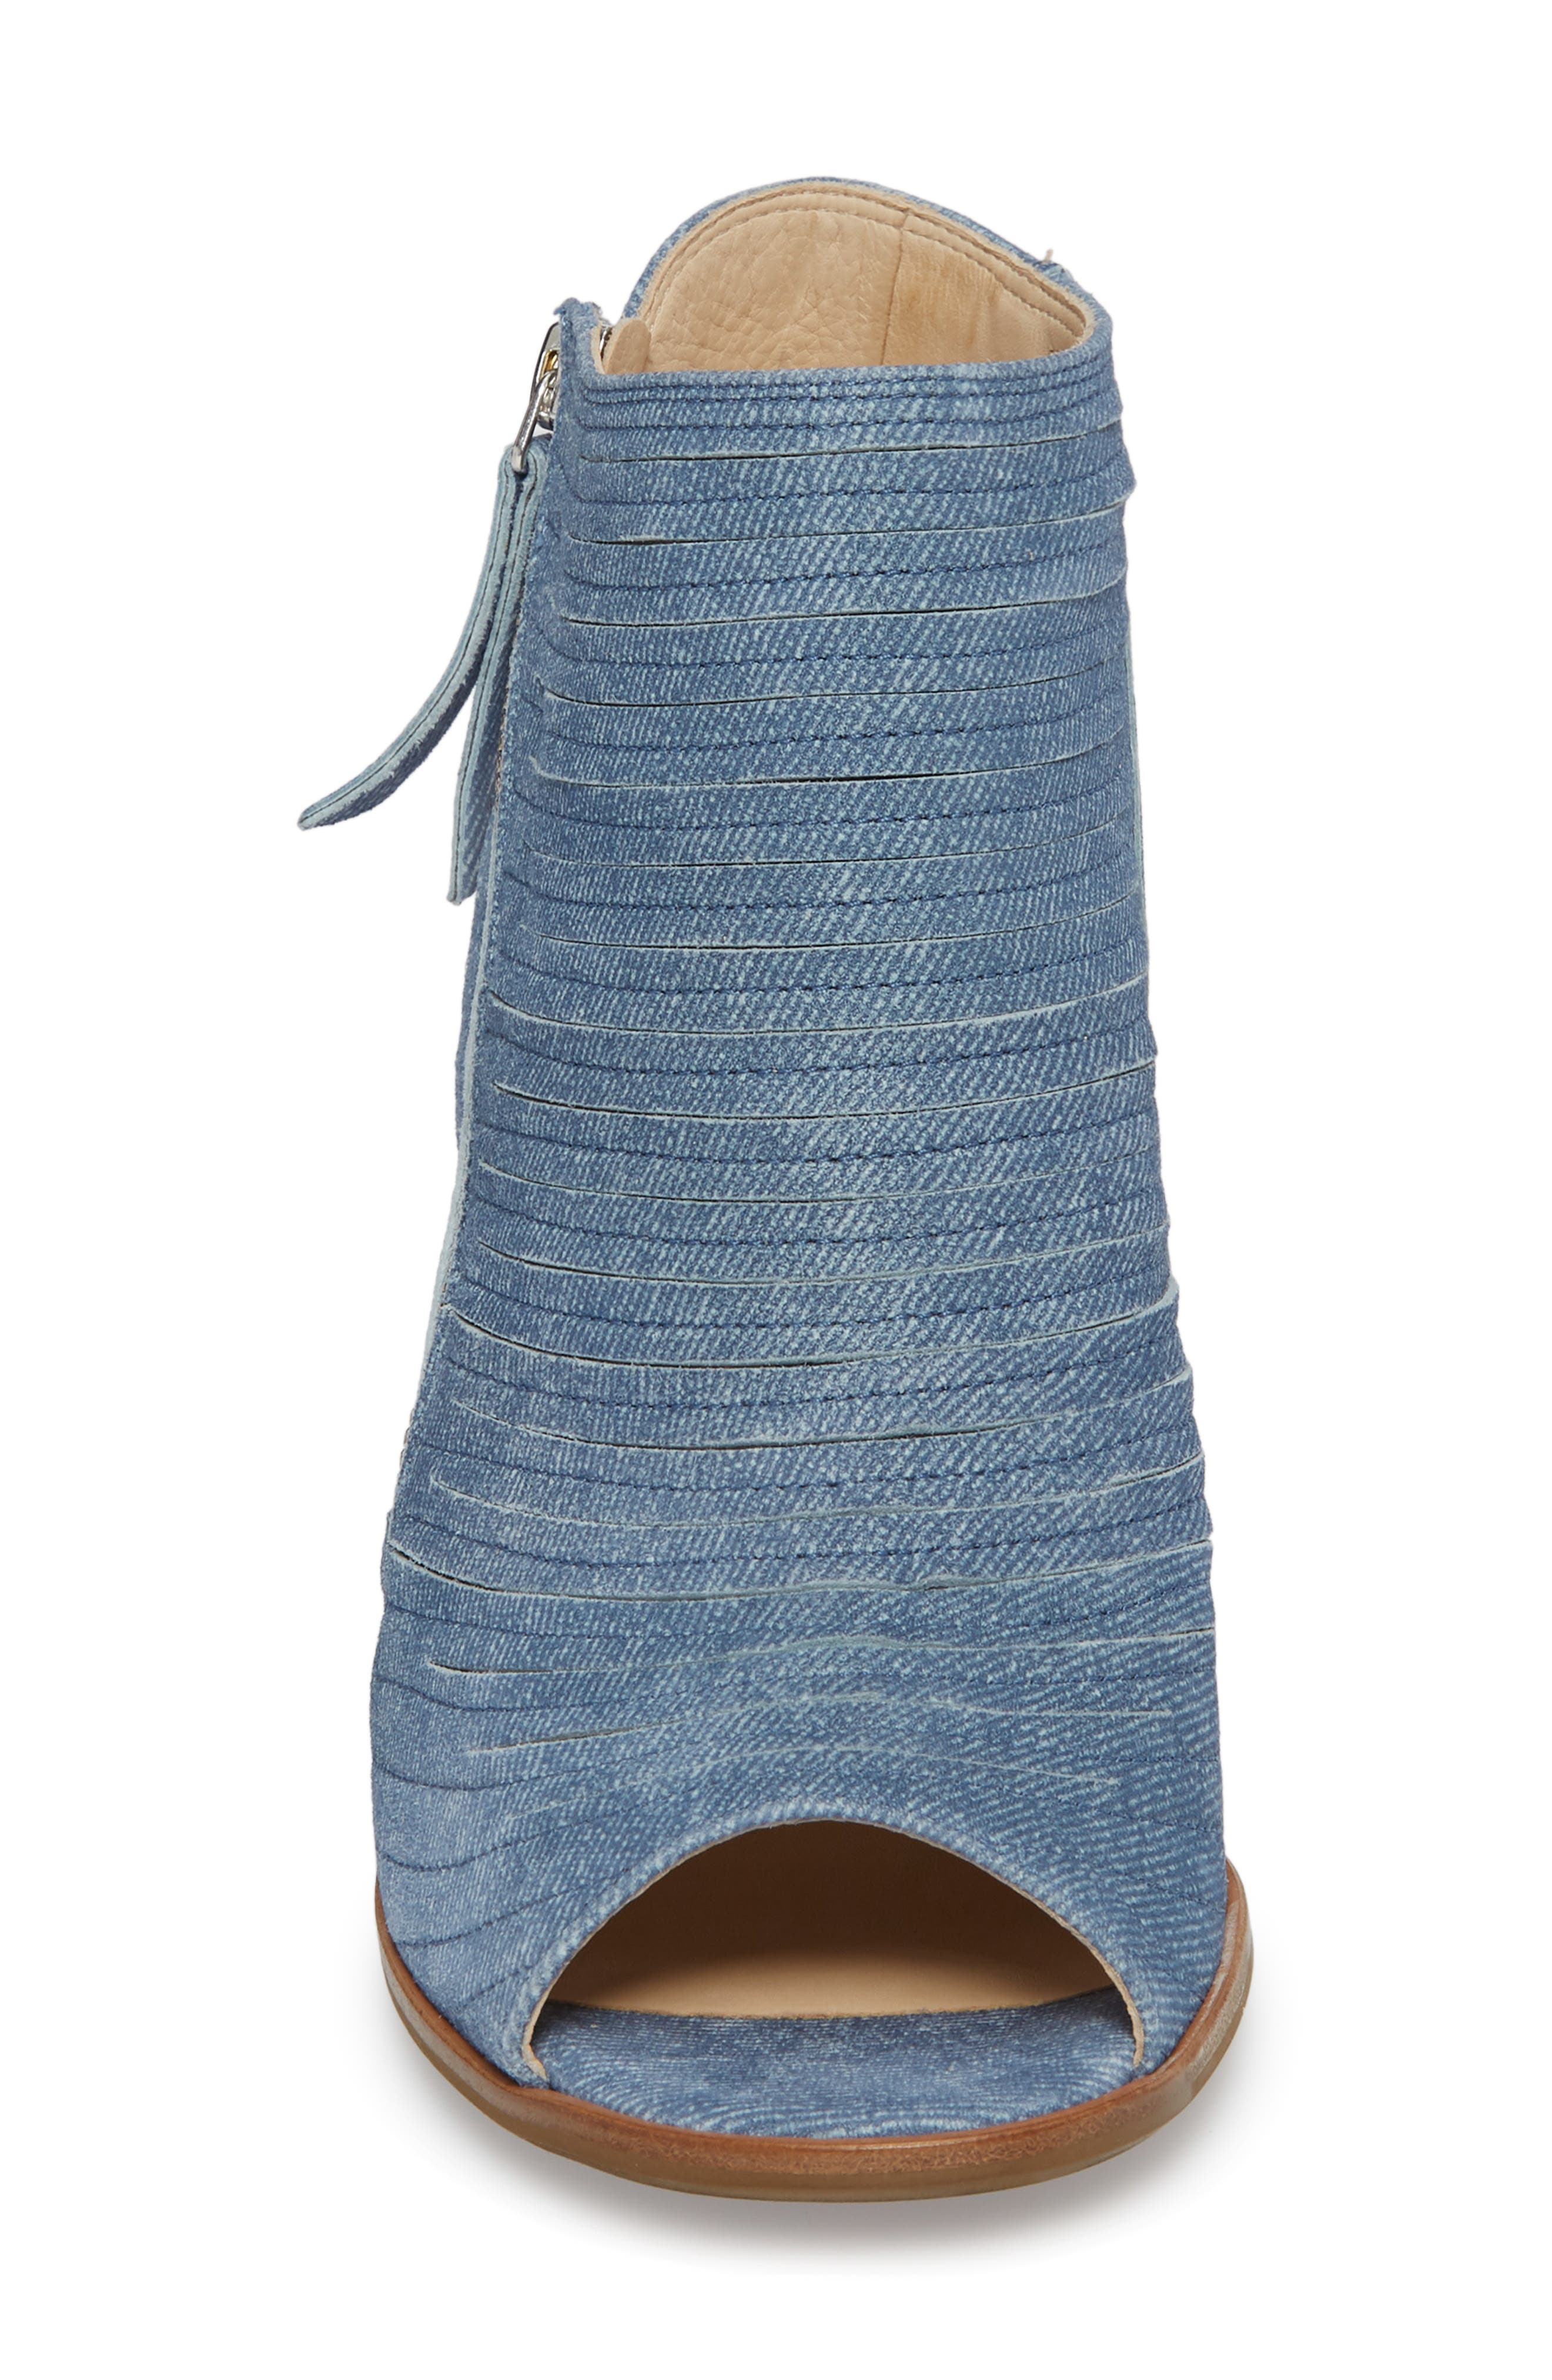 'Cayanne' Leather Peep Toe Sandal,                             Alternate thumbnail 29, color,